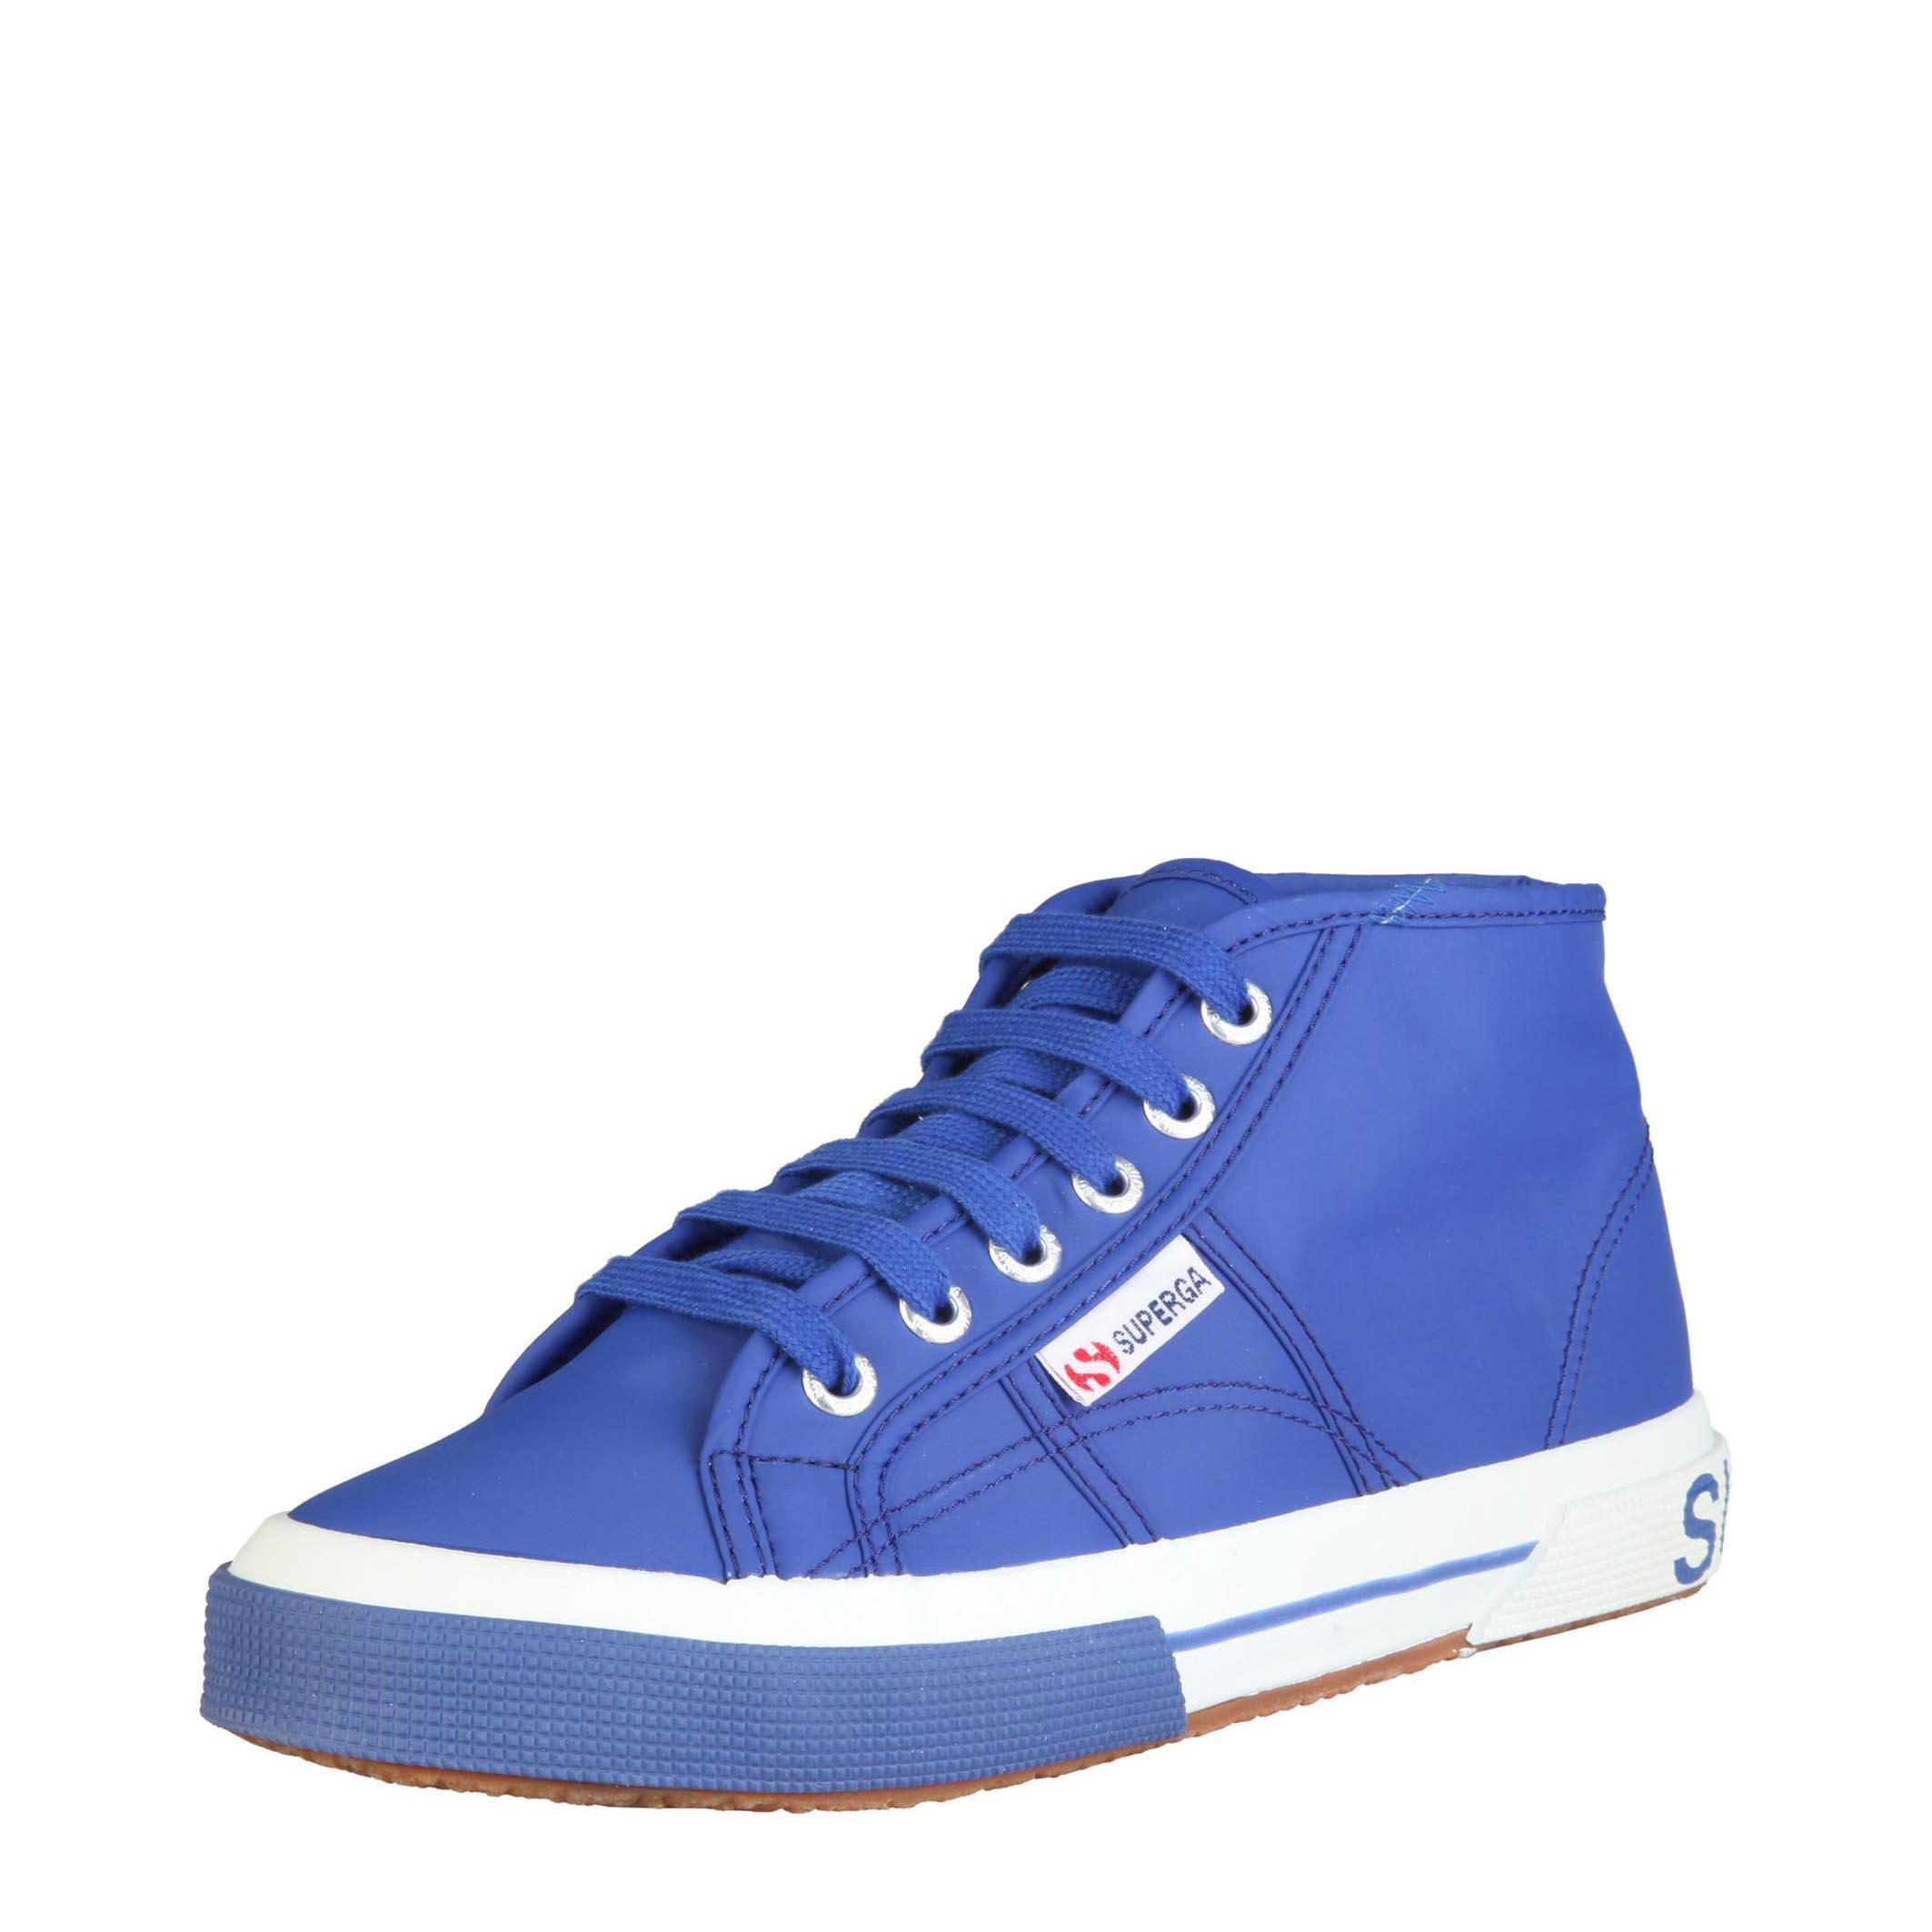 Chaussures   Superga S007A70_2754 blue